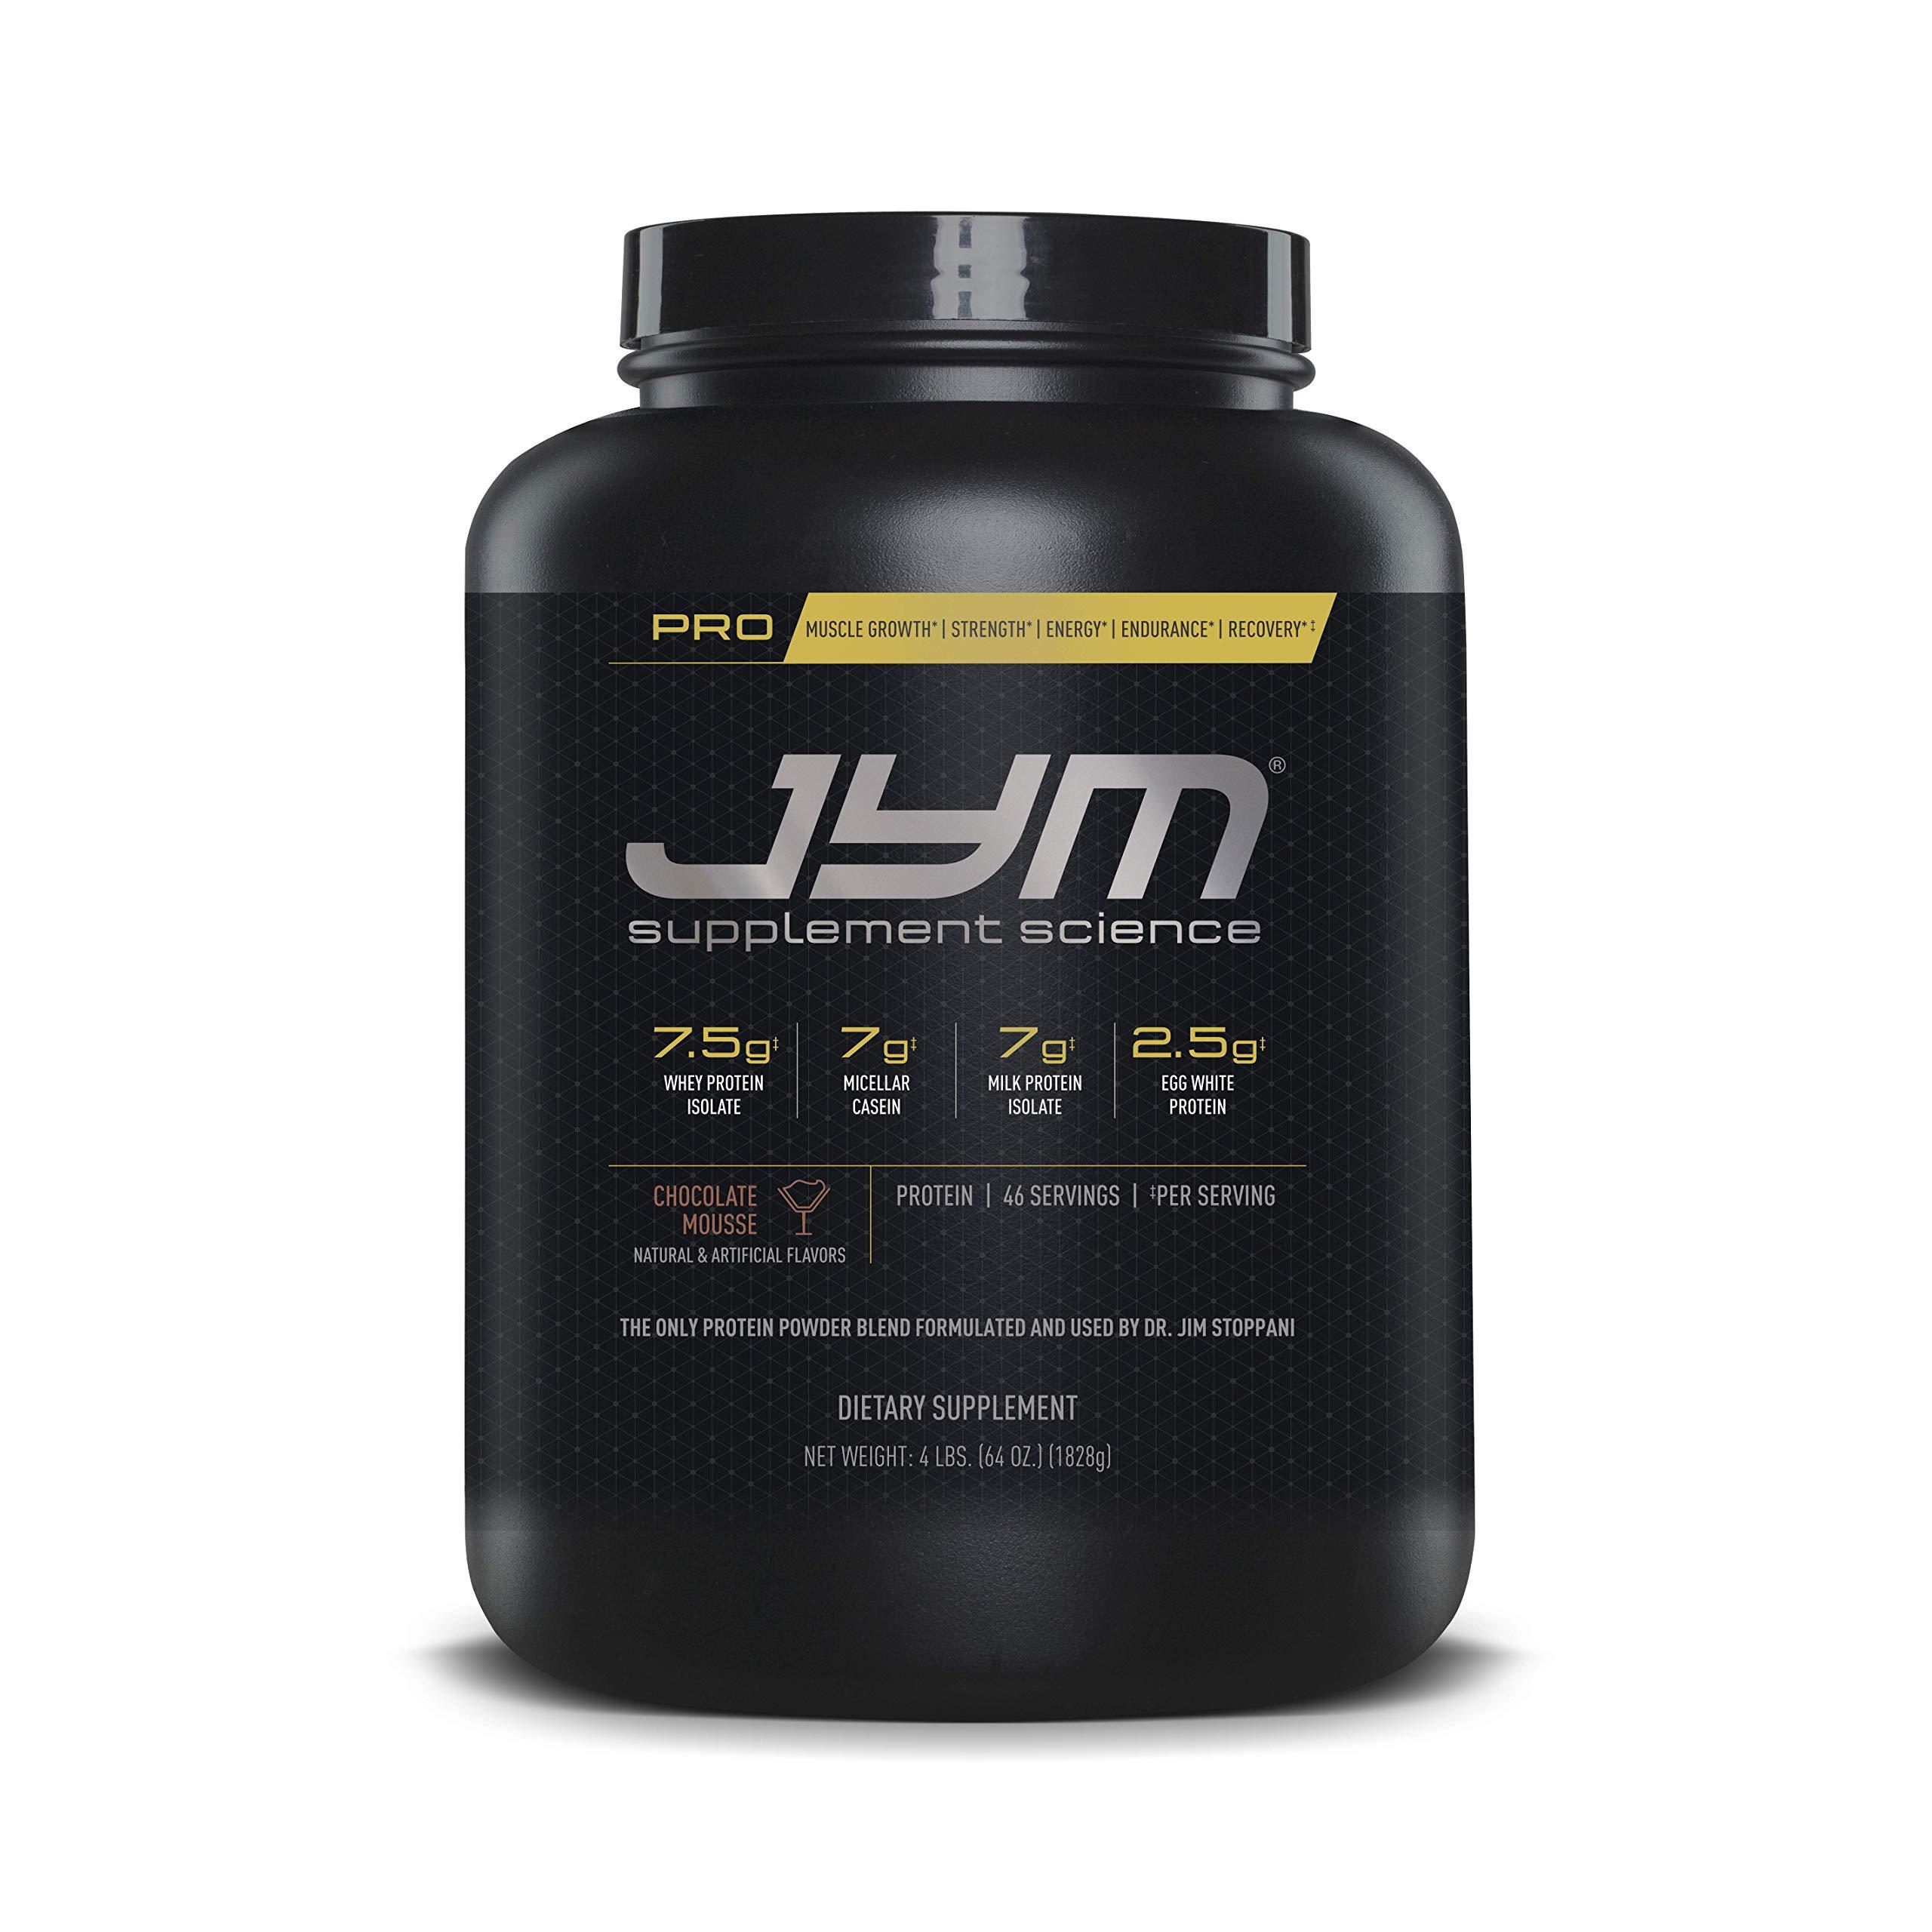 Pro JYM Protein Powder - Egg White, Milk, Whey Protein Isolates & Micellar Casein | JYM Supplement Science | Chocolate Mousse Flavor, 4 lb by JYM Supplement Science